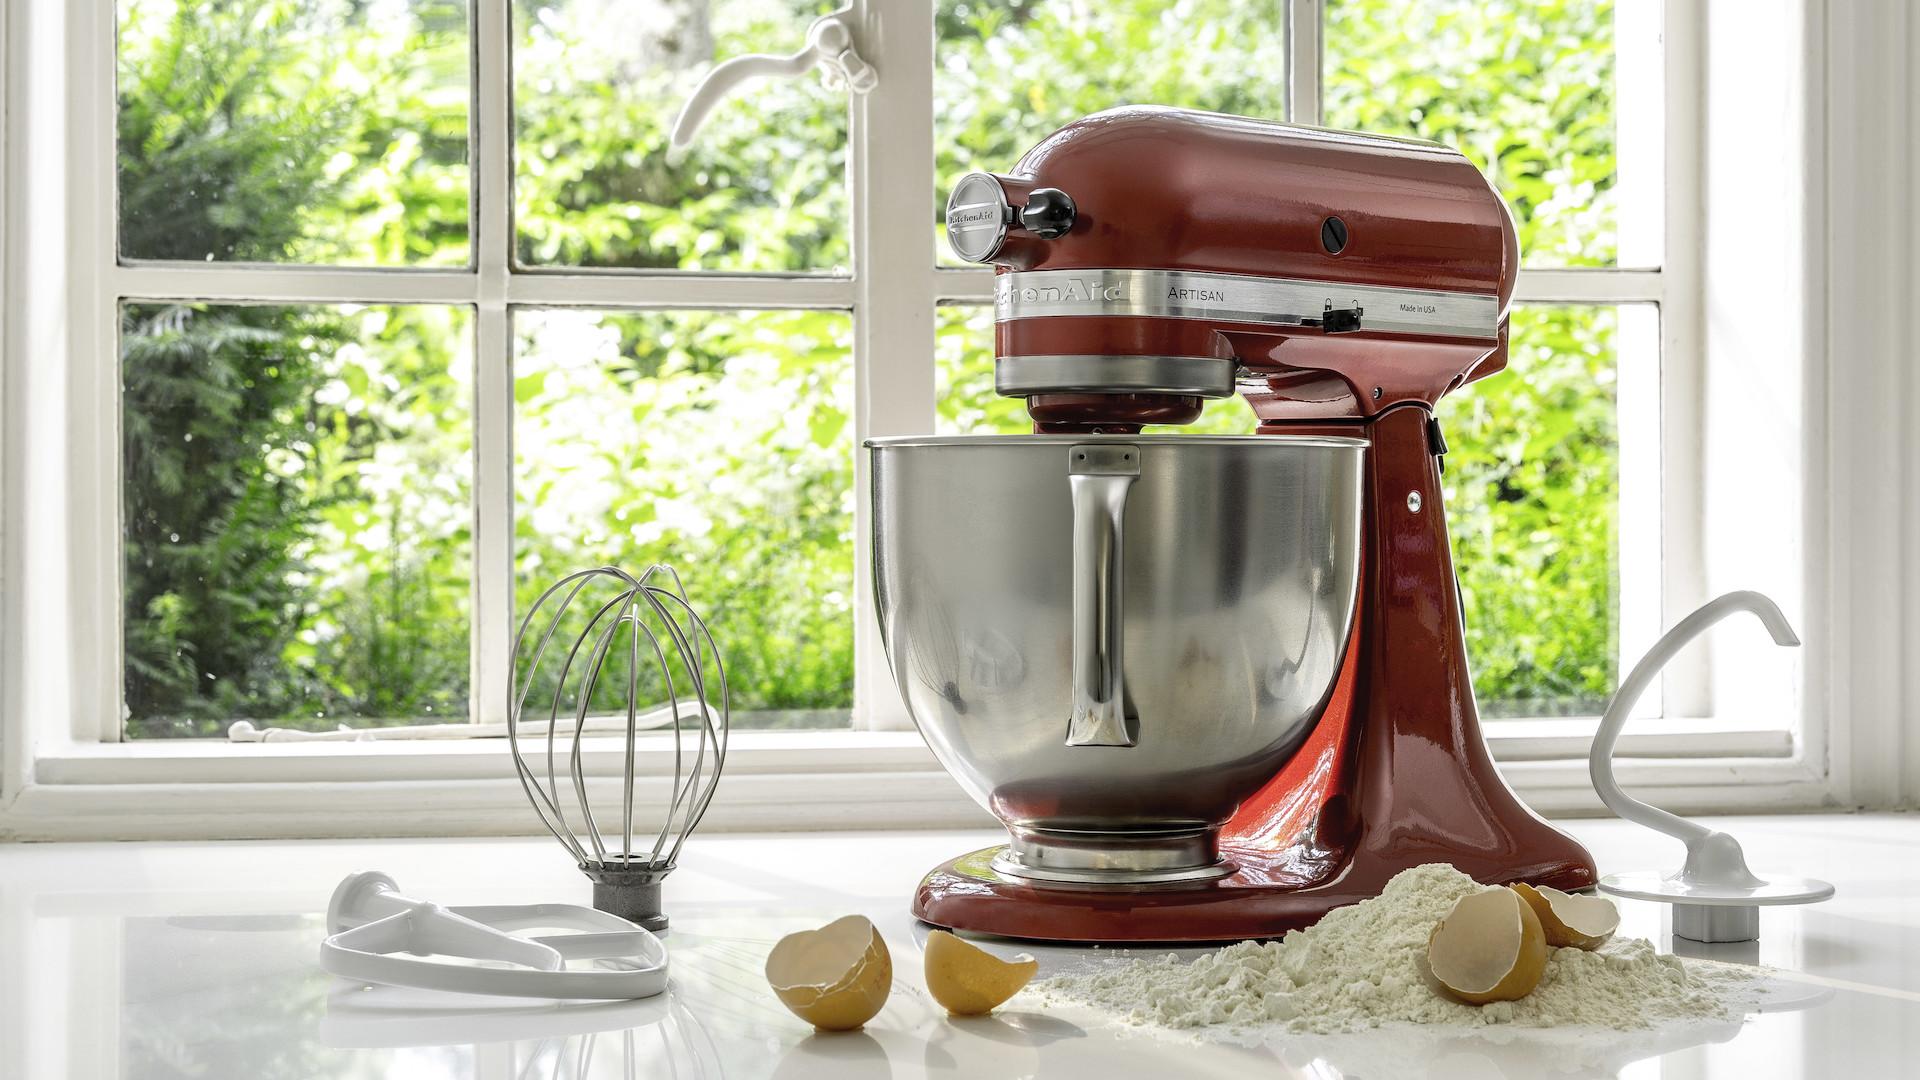 Should I buy a KitchenAid appliance? | TechRadar